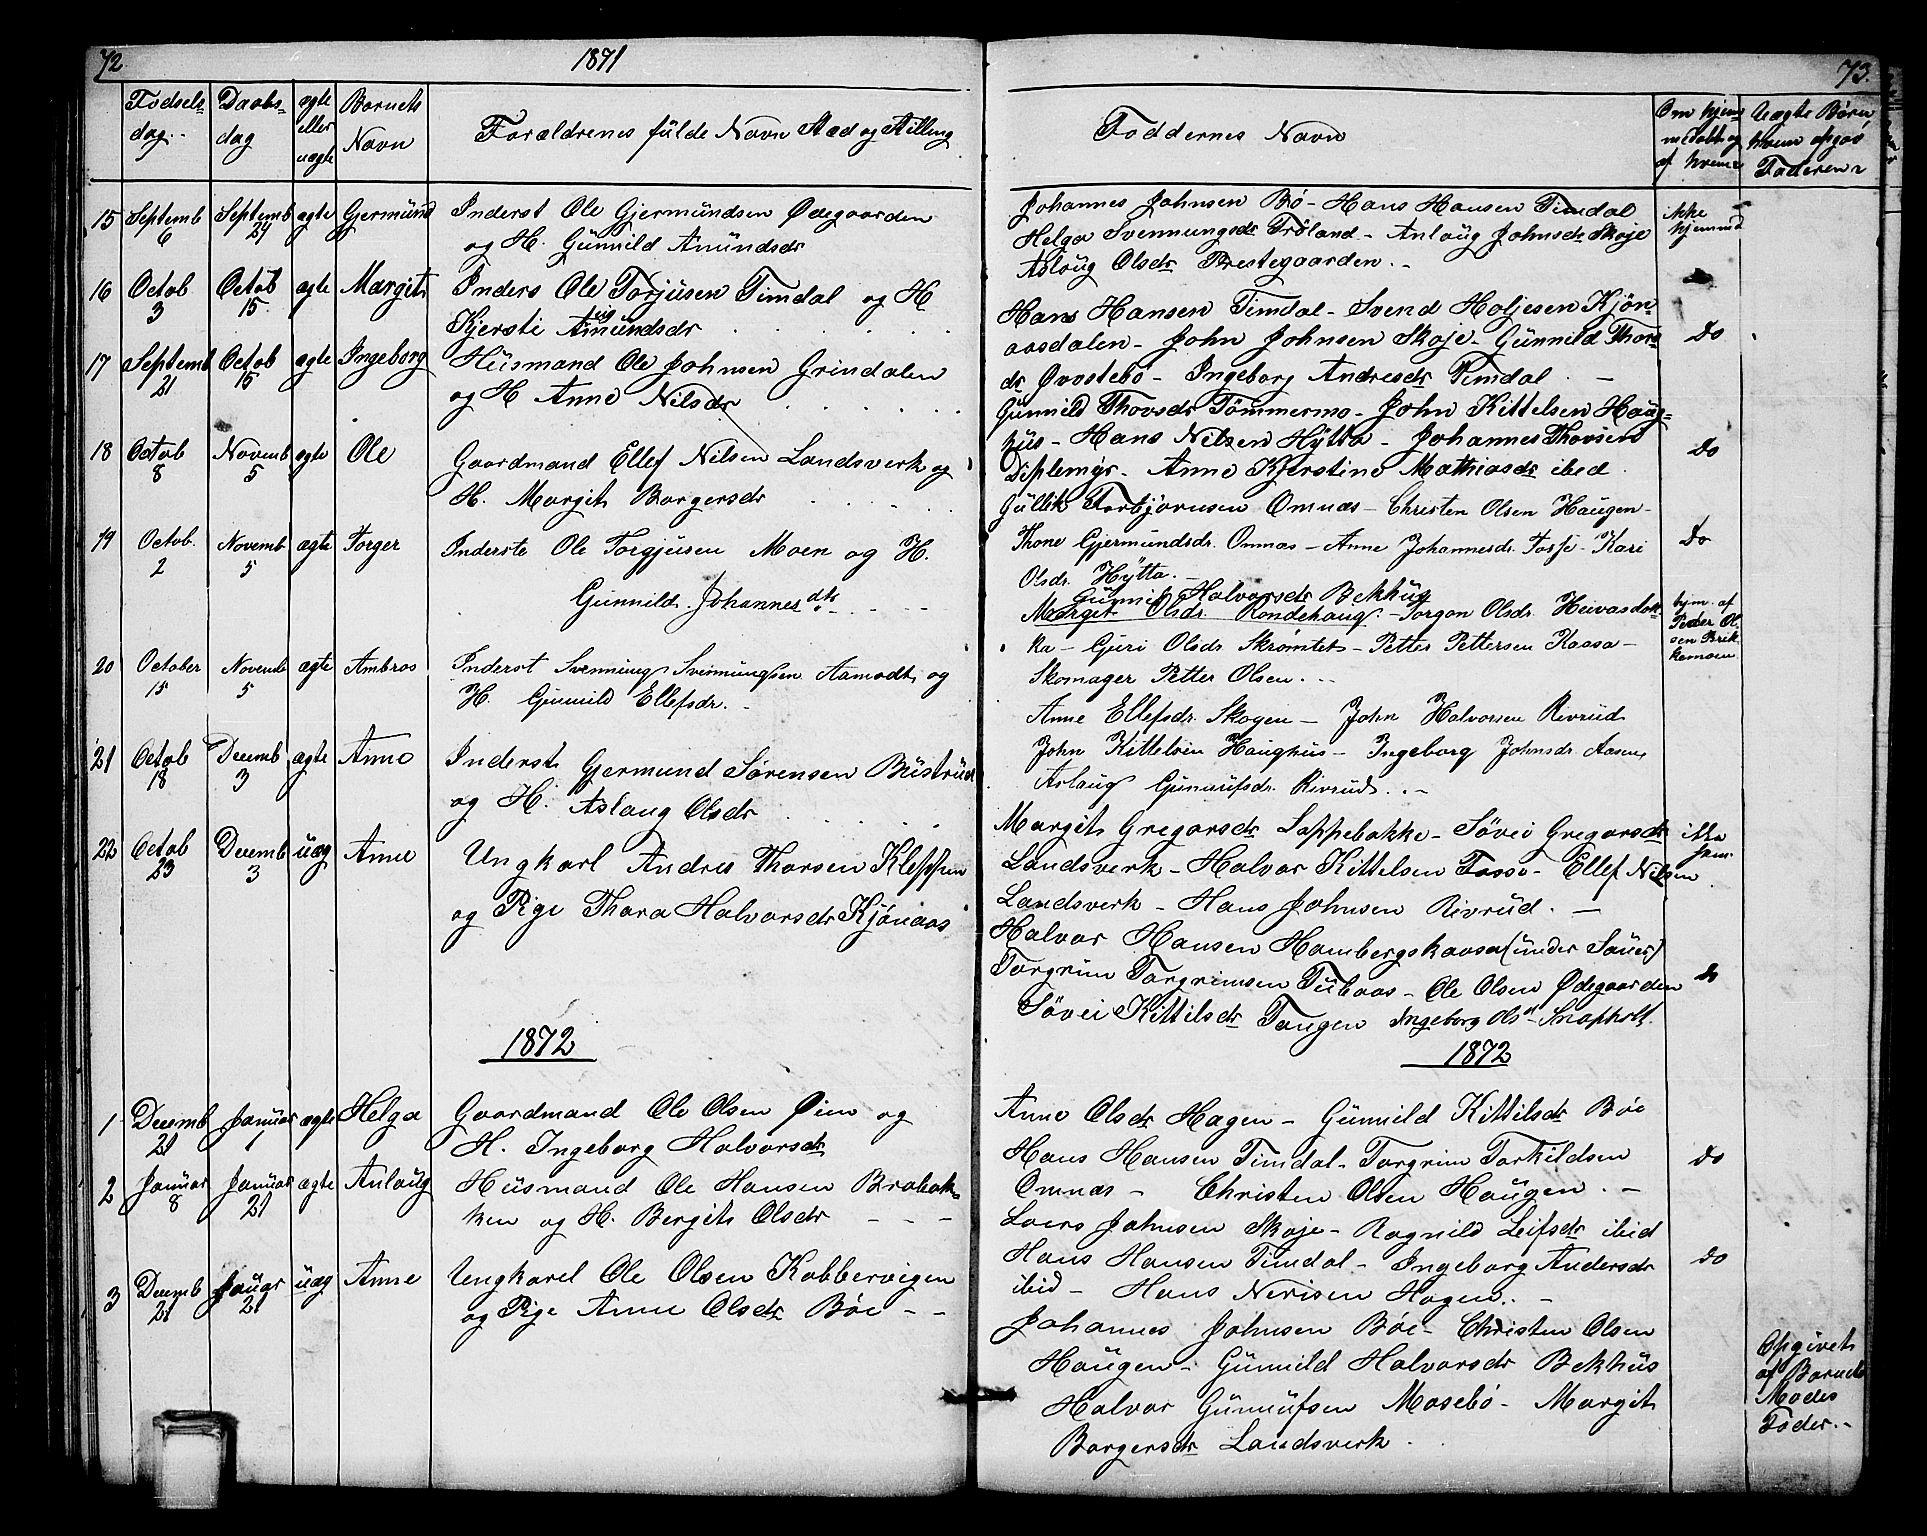 SAKO, Hjartdal kirkebøker, G/Gb/L0002: Klokkerbok nr. II 2, 1854-1884, s. 72-73